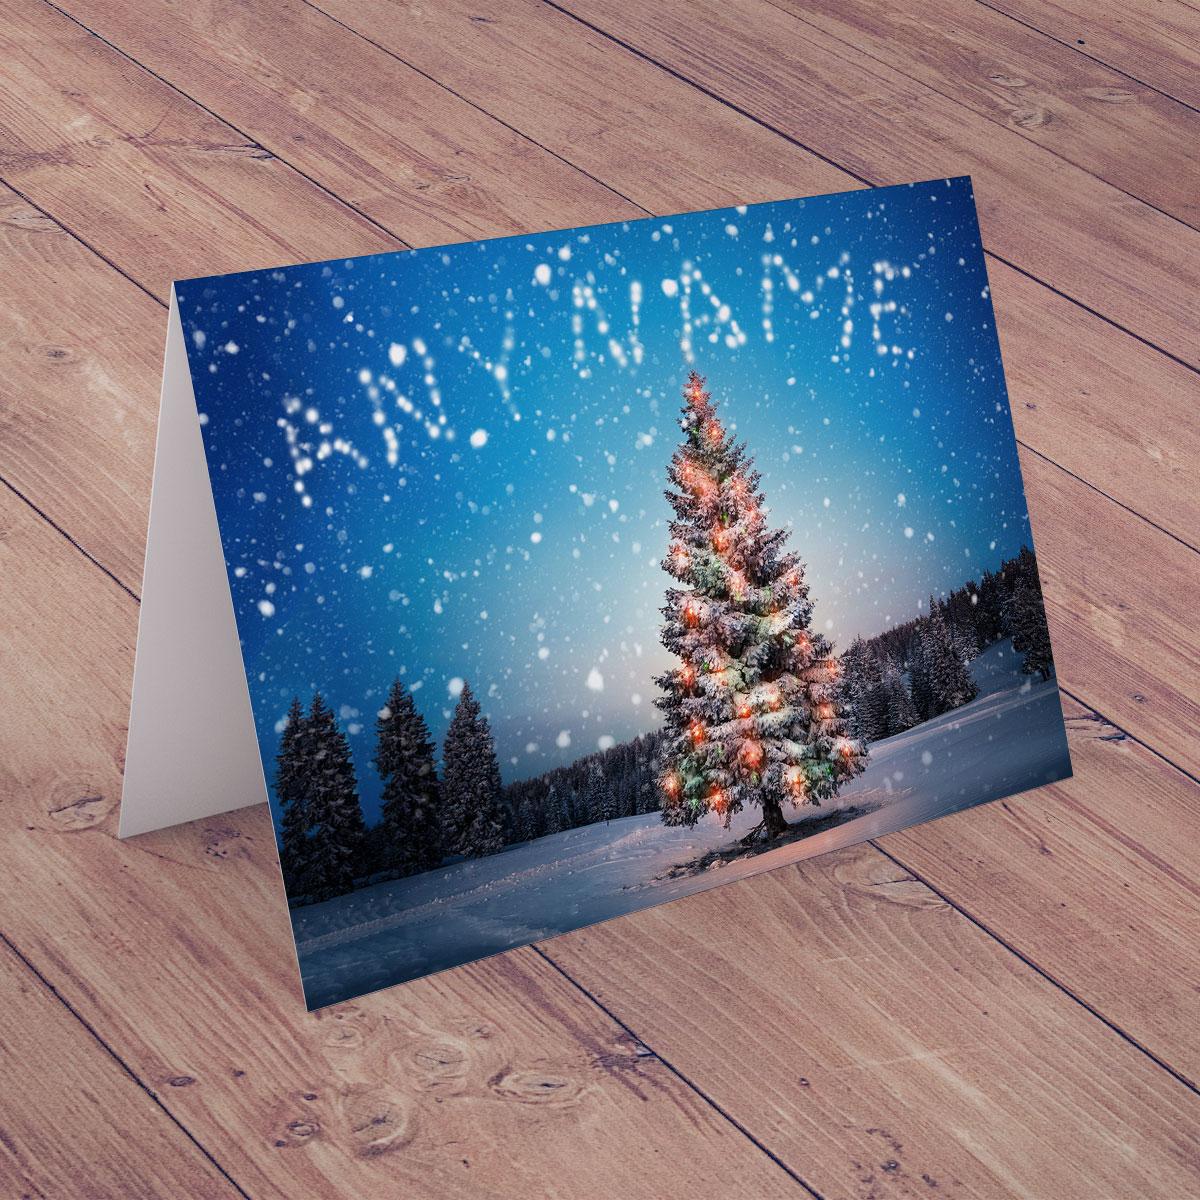 Personalised Christmas Card - Snowy Christmas Tree